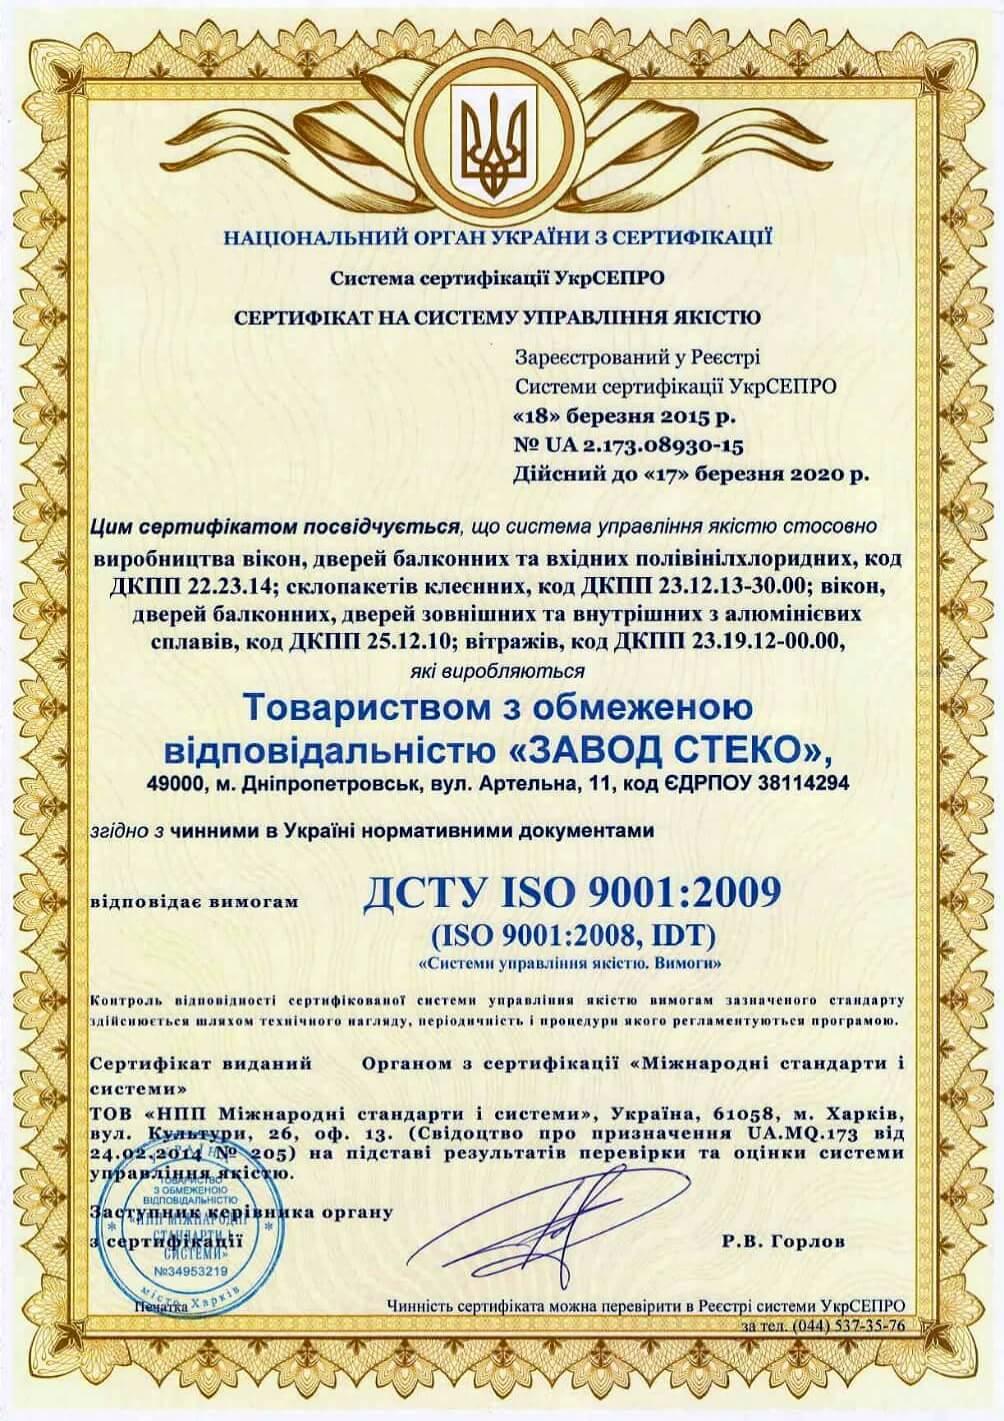 sertisicate-1